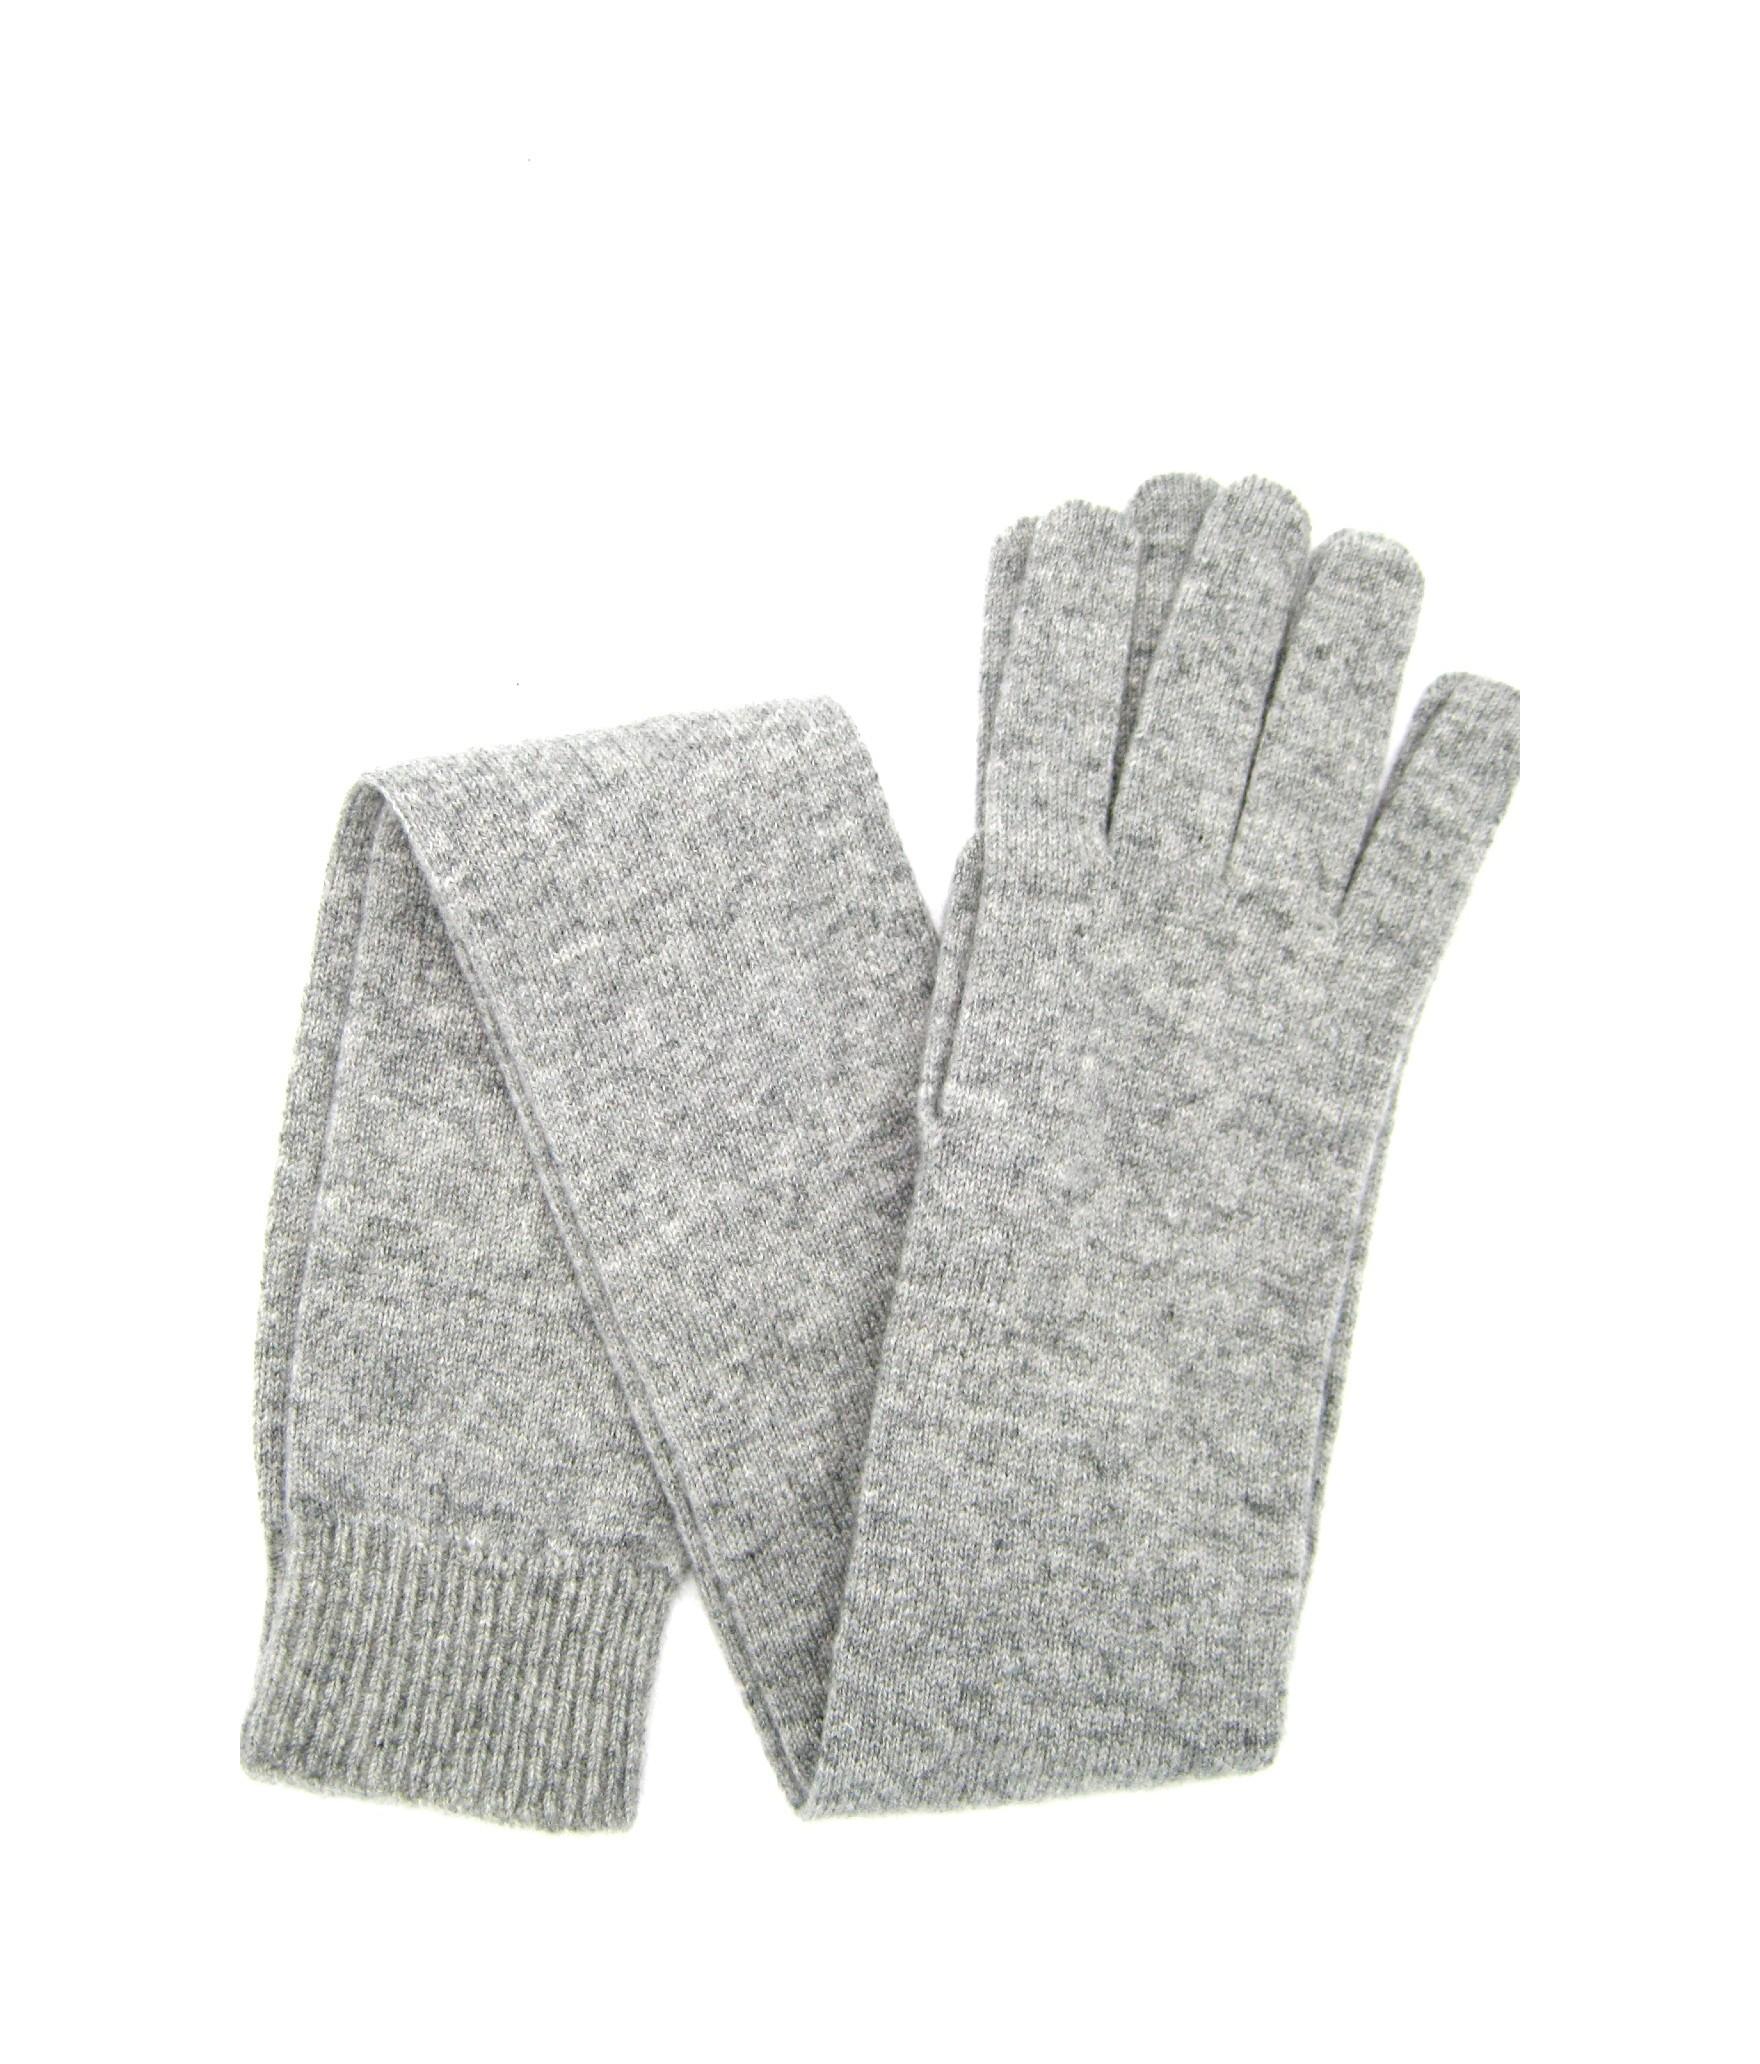 100%cashmere gloves 16bt Light Grey Sermoneta Gloves Leather